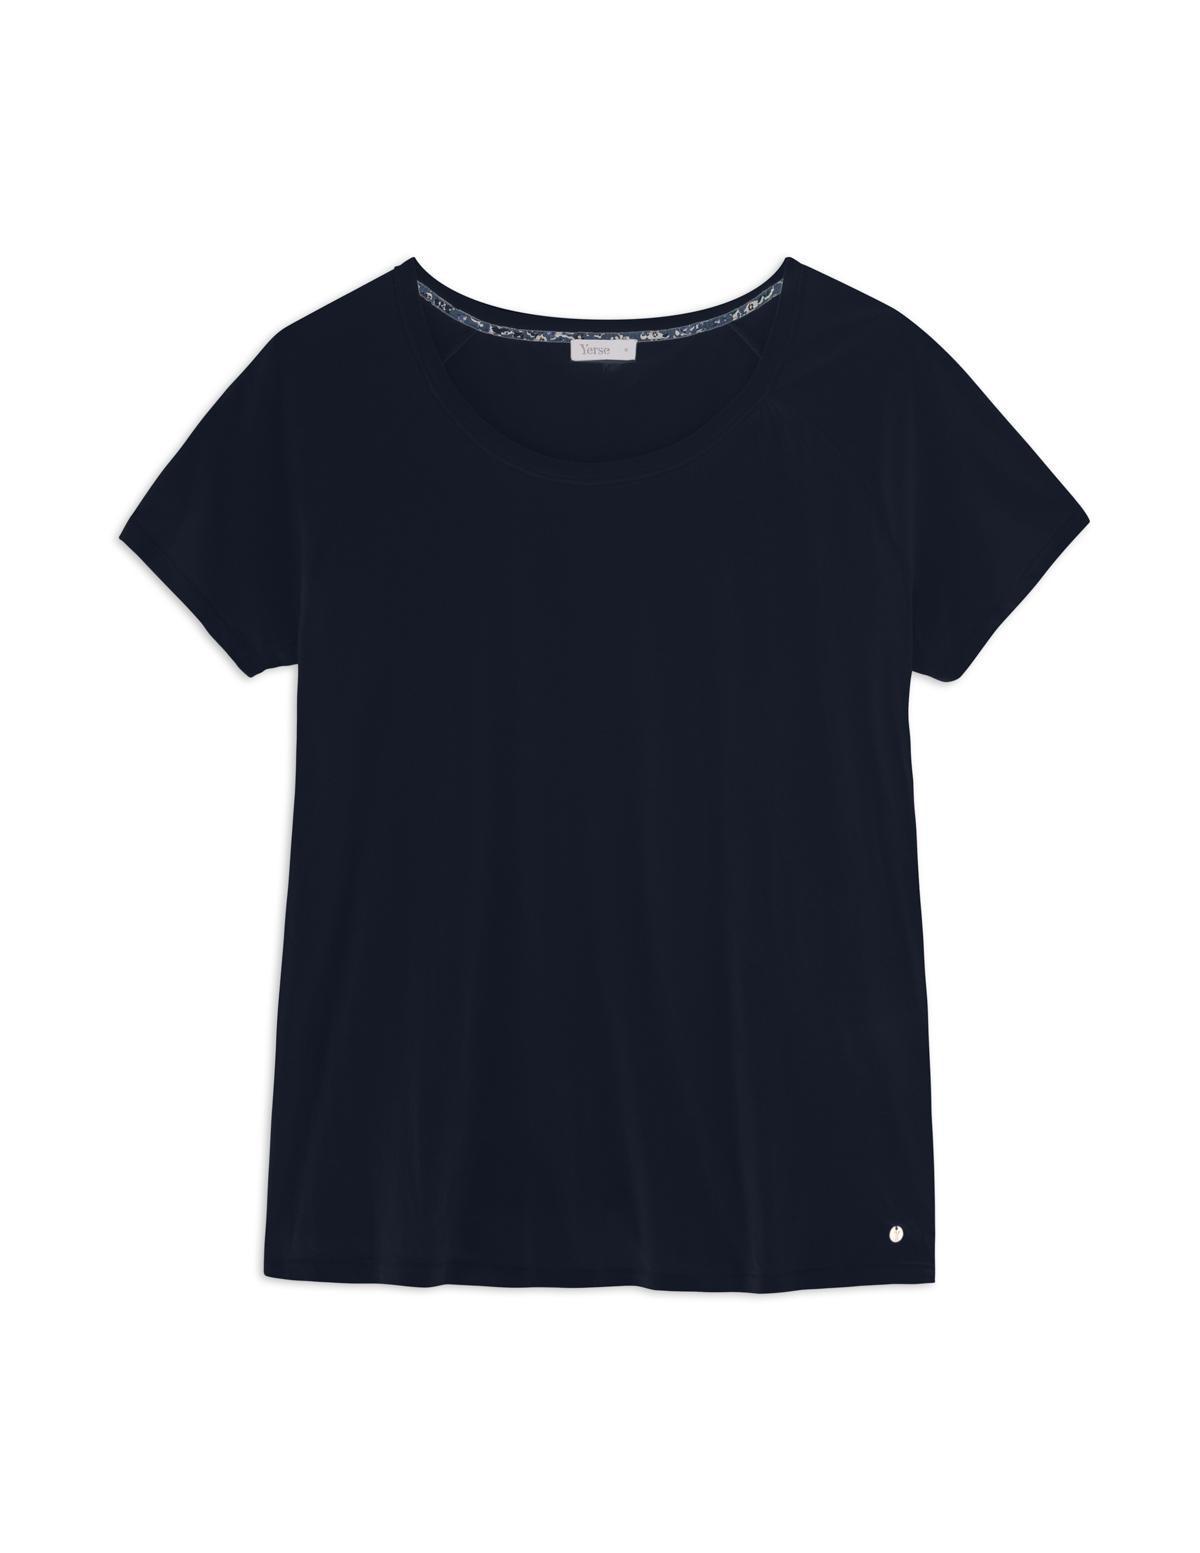 Set camisetas manga corta - Ítem1